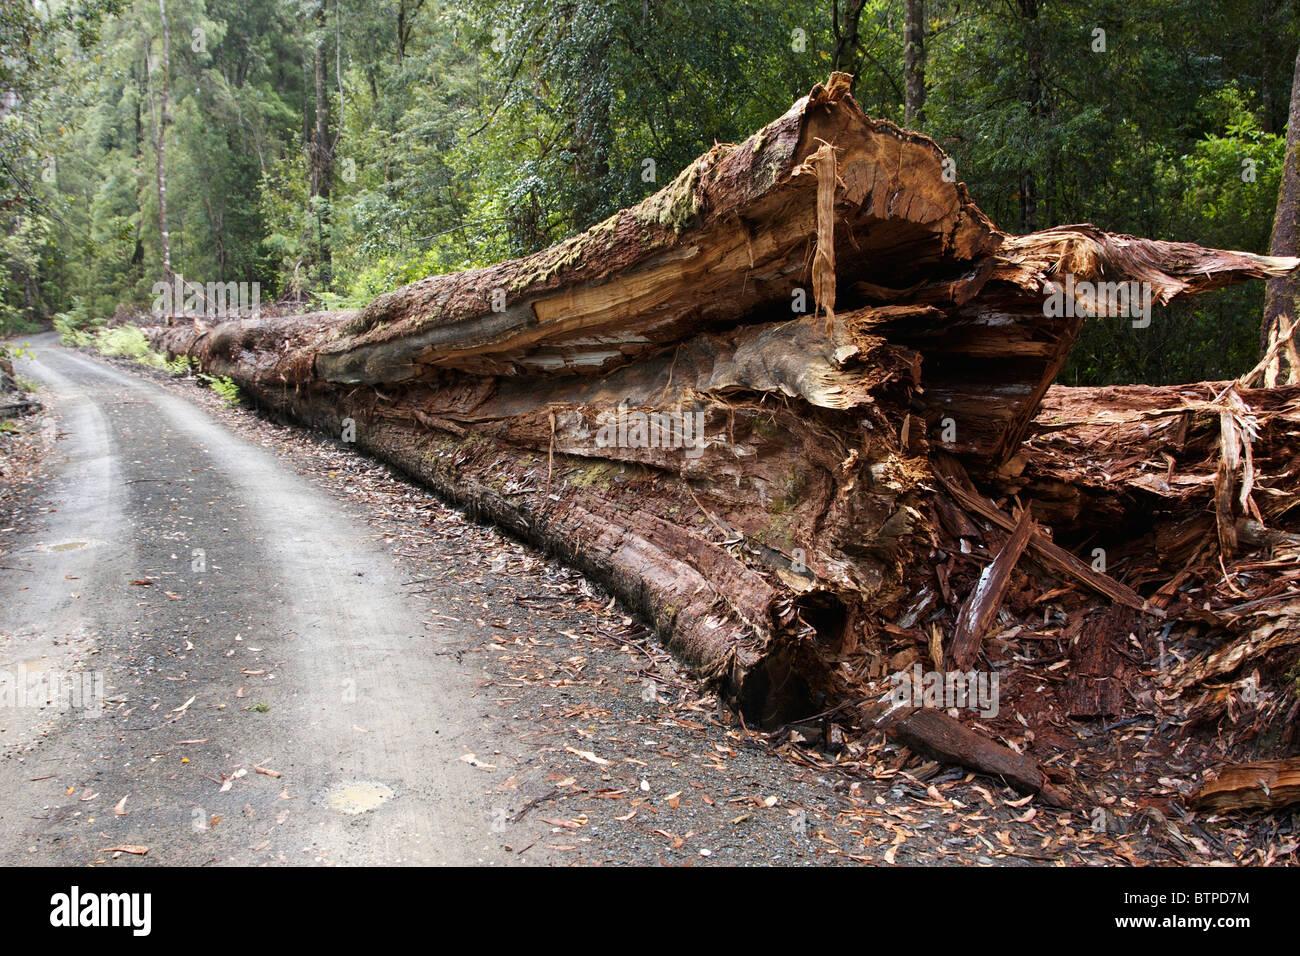 Australia, Tasmania, Tahune, Fallen tree Stock Photo